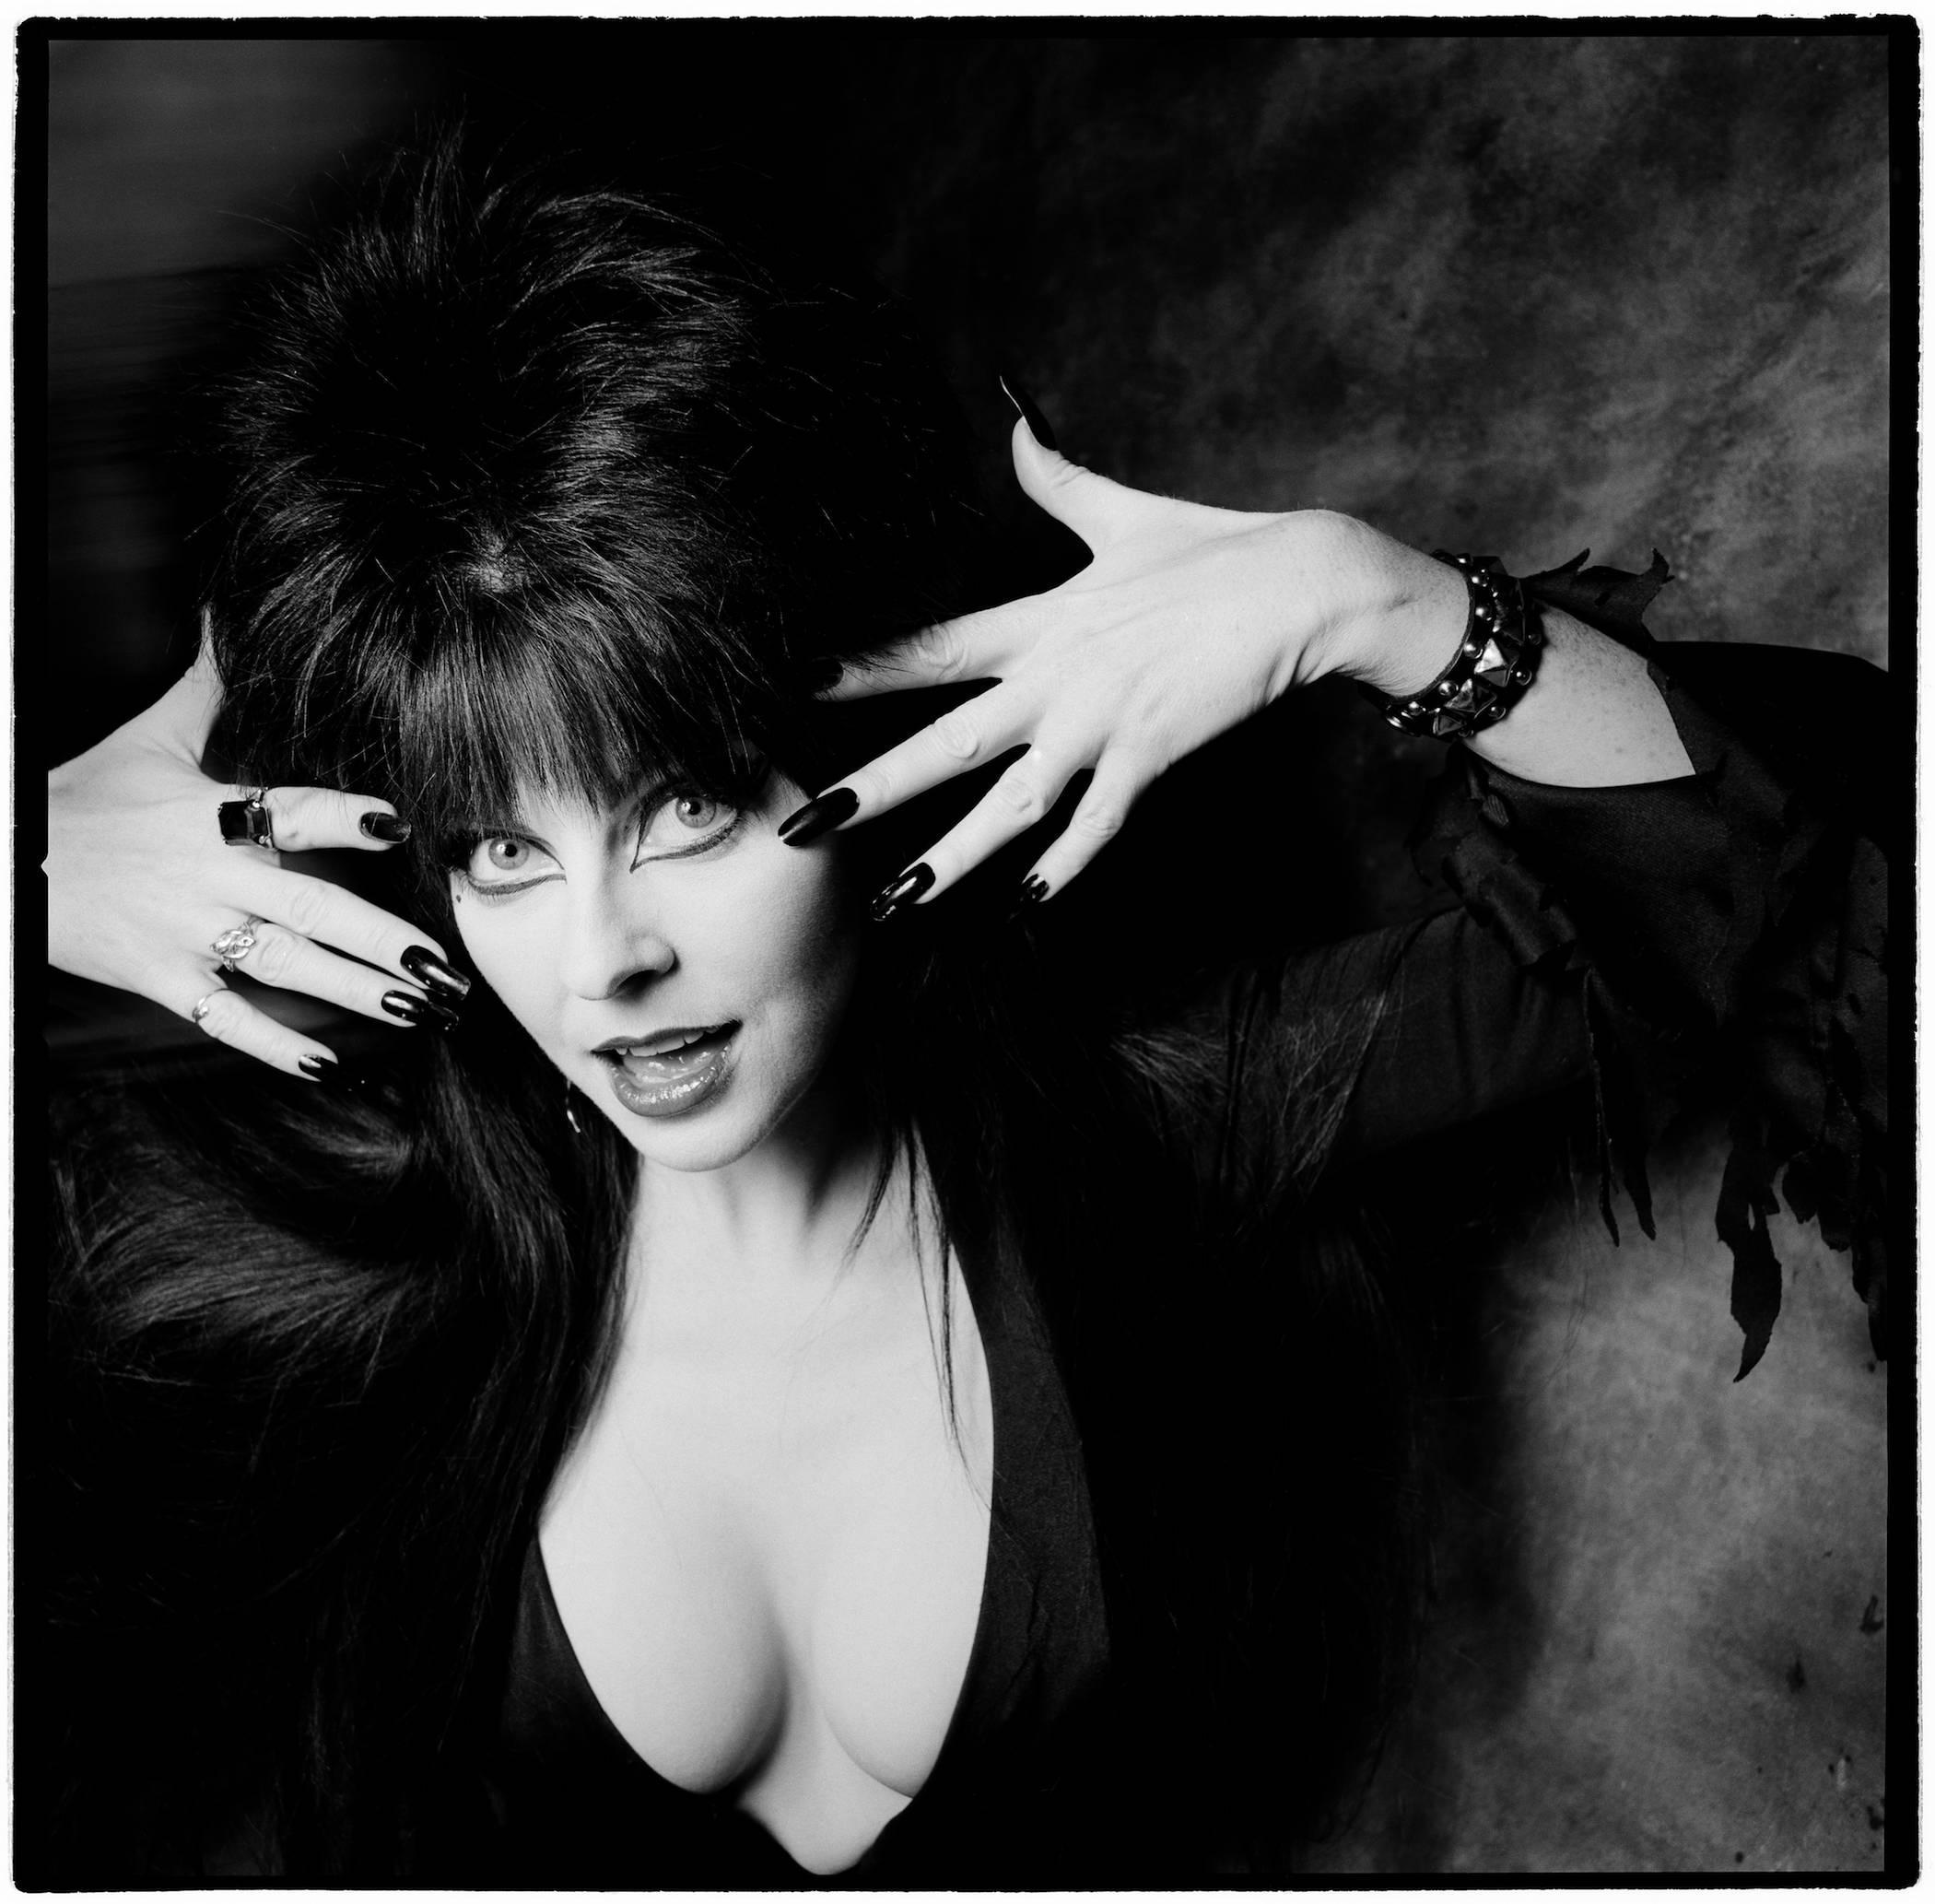 Elvira • 1987 • NYC • Saturday Night Live